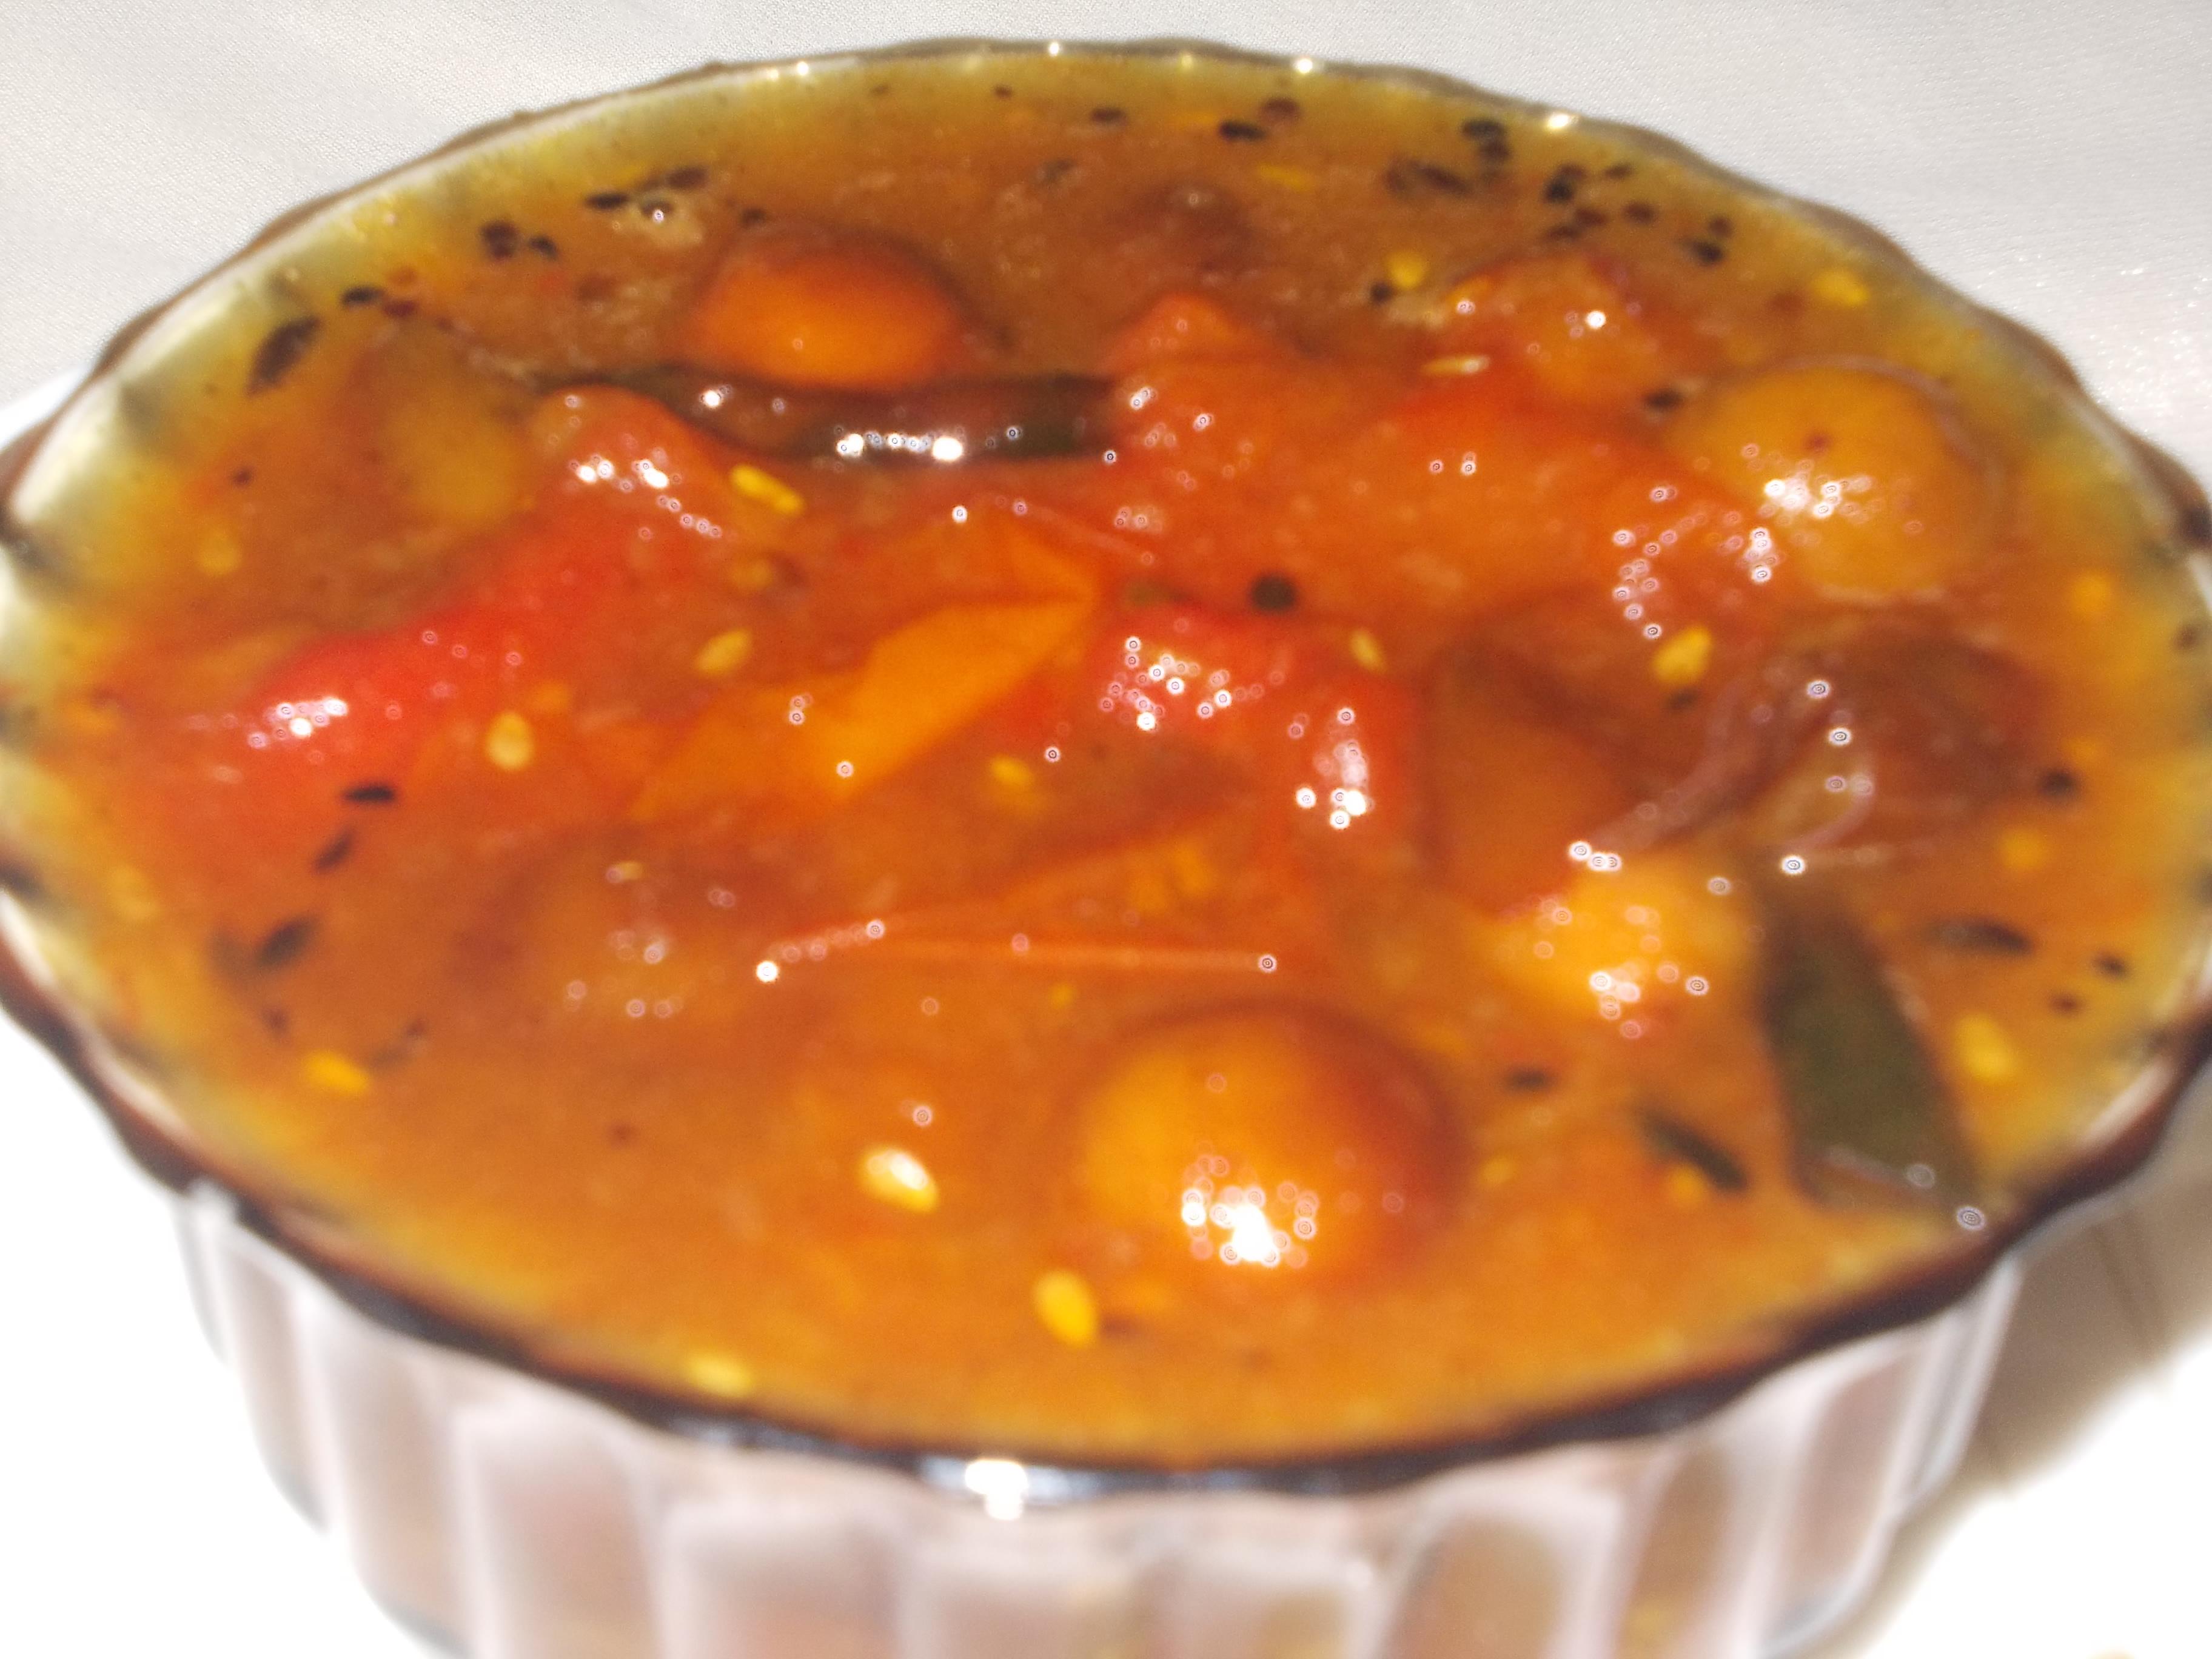 Tomato & Topa-kuler Chutney Recipe